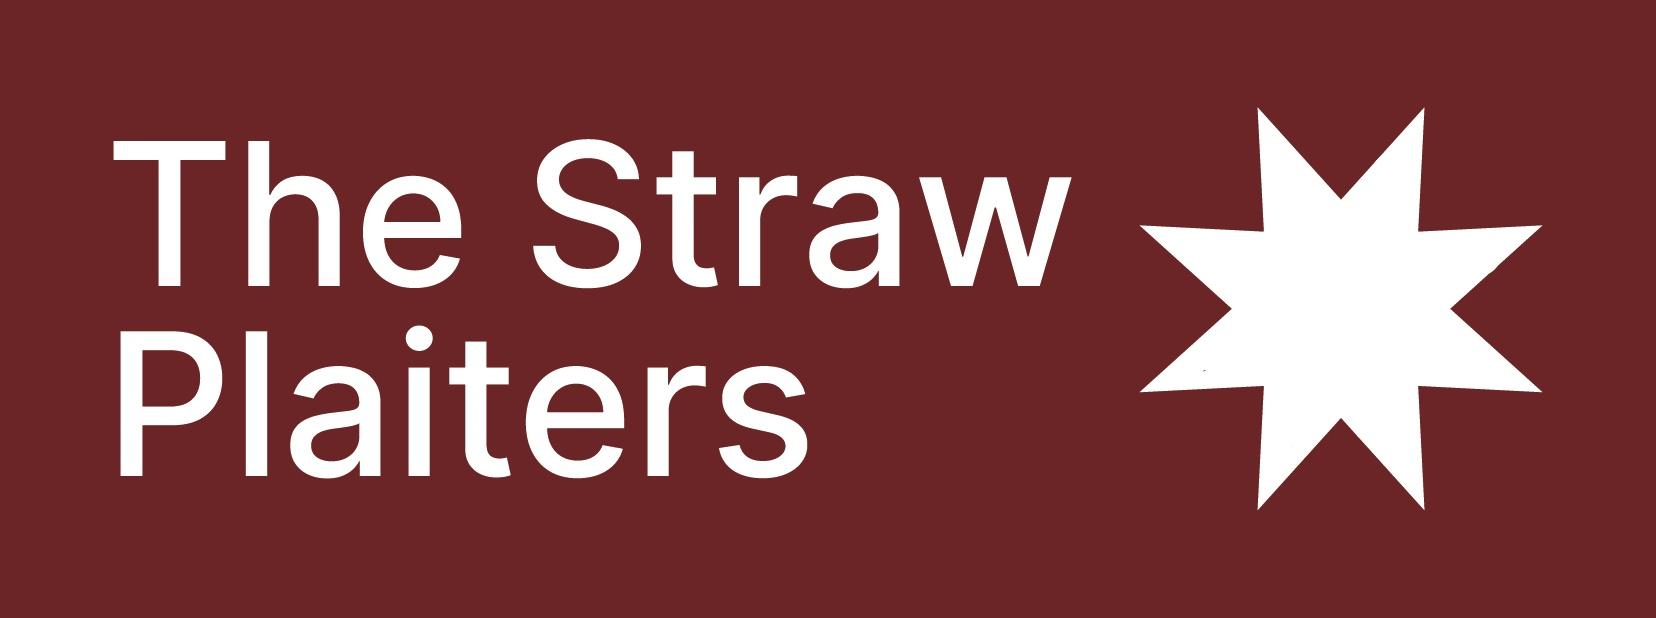 The Straw Plaiters